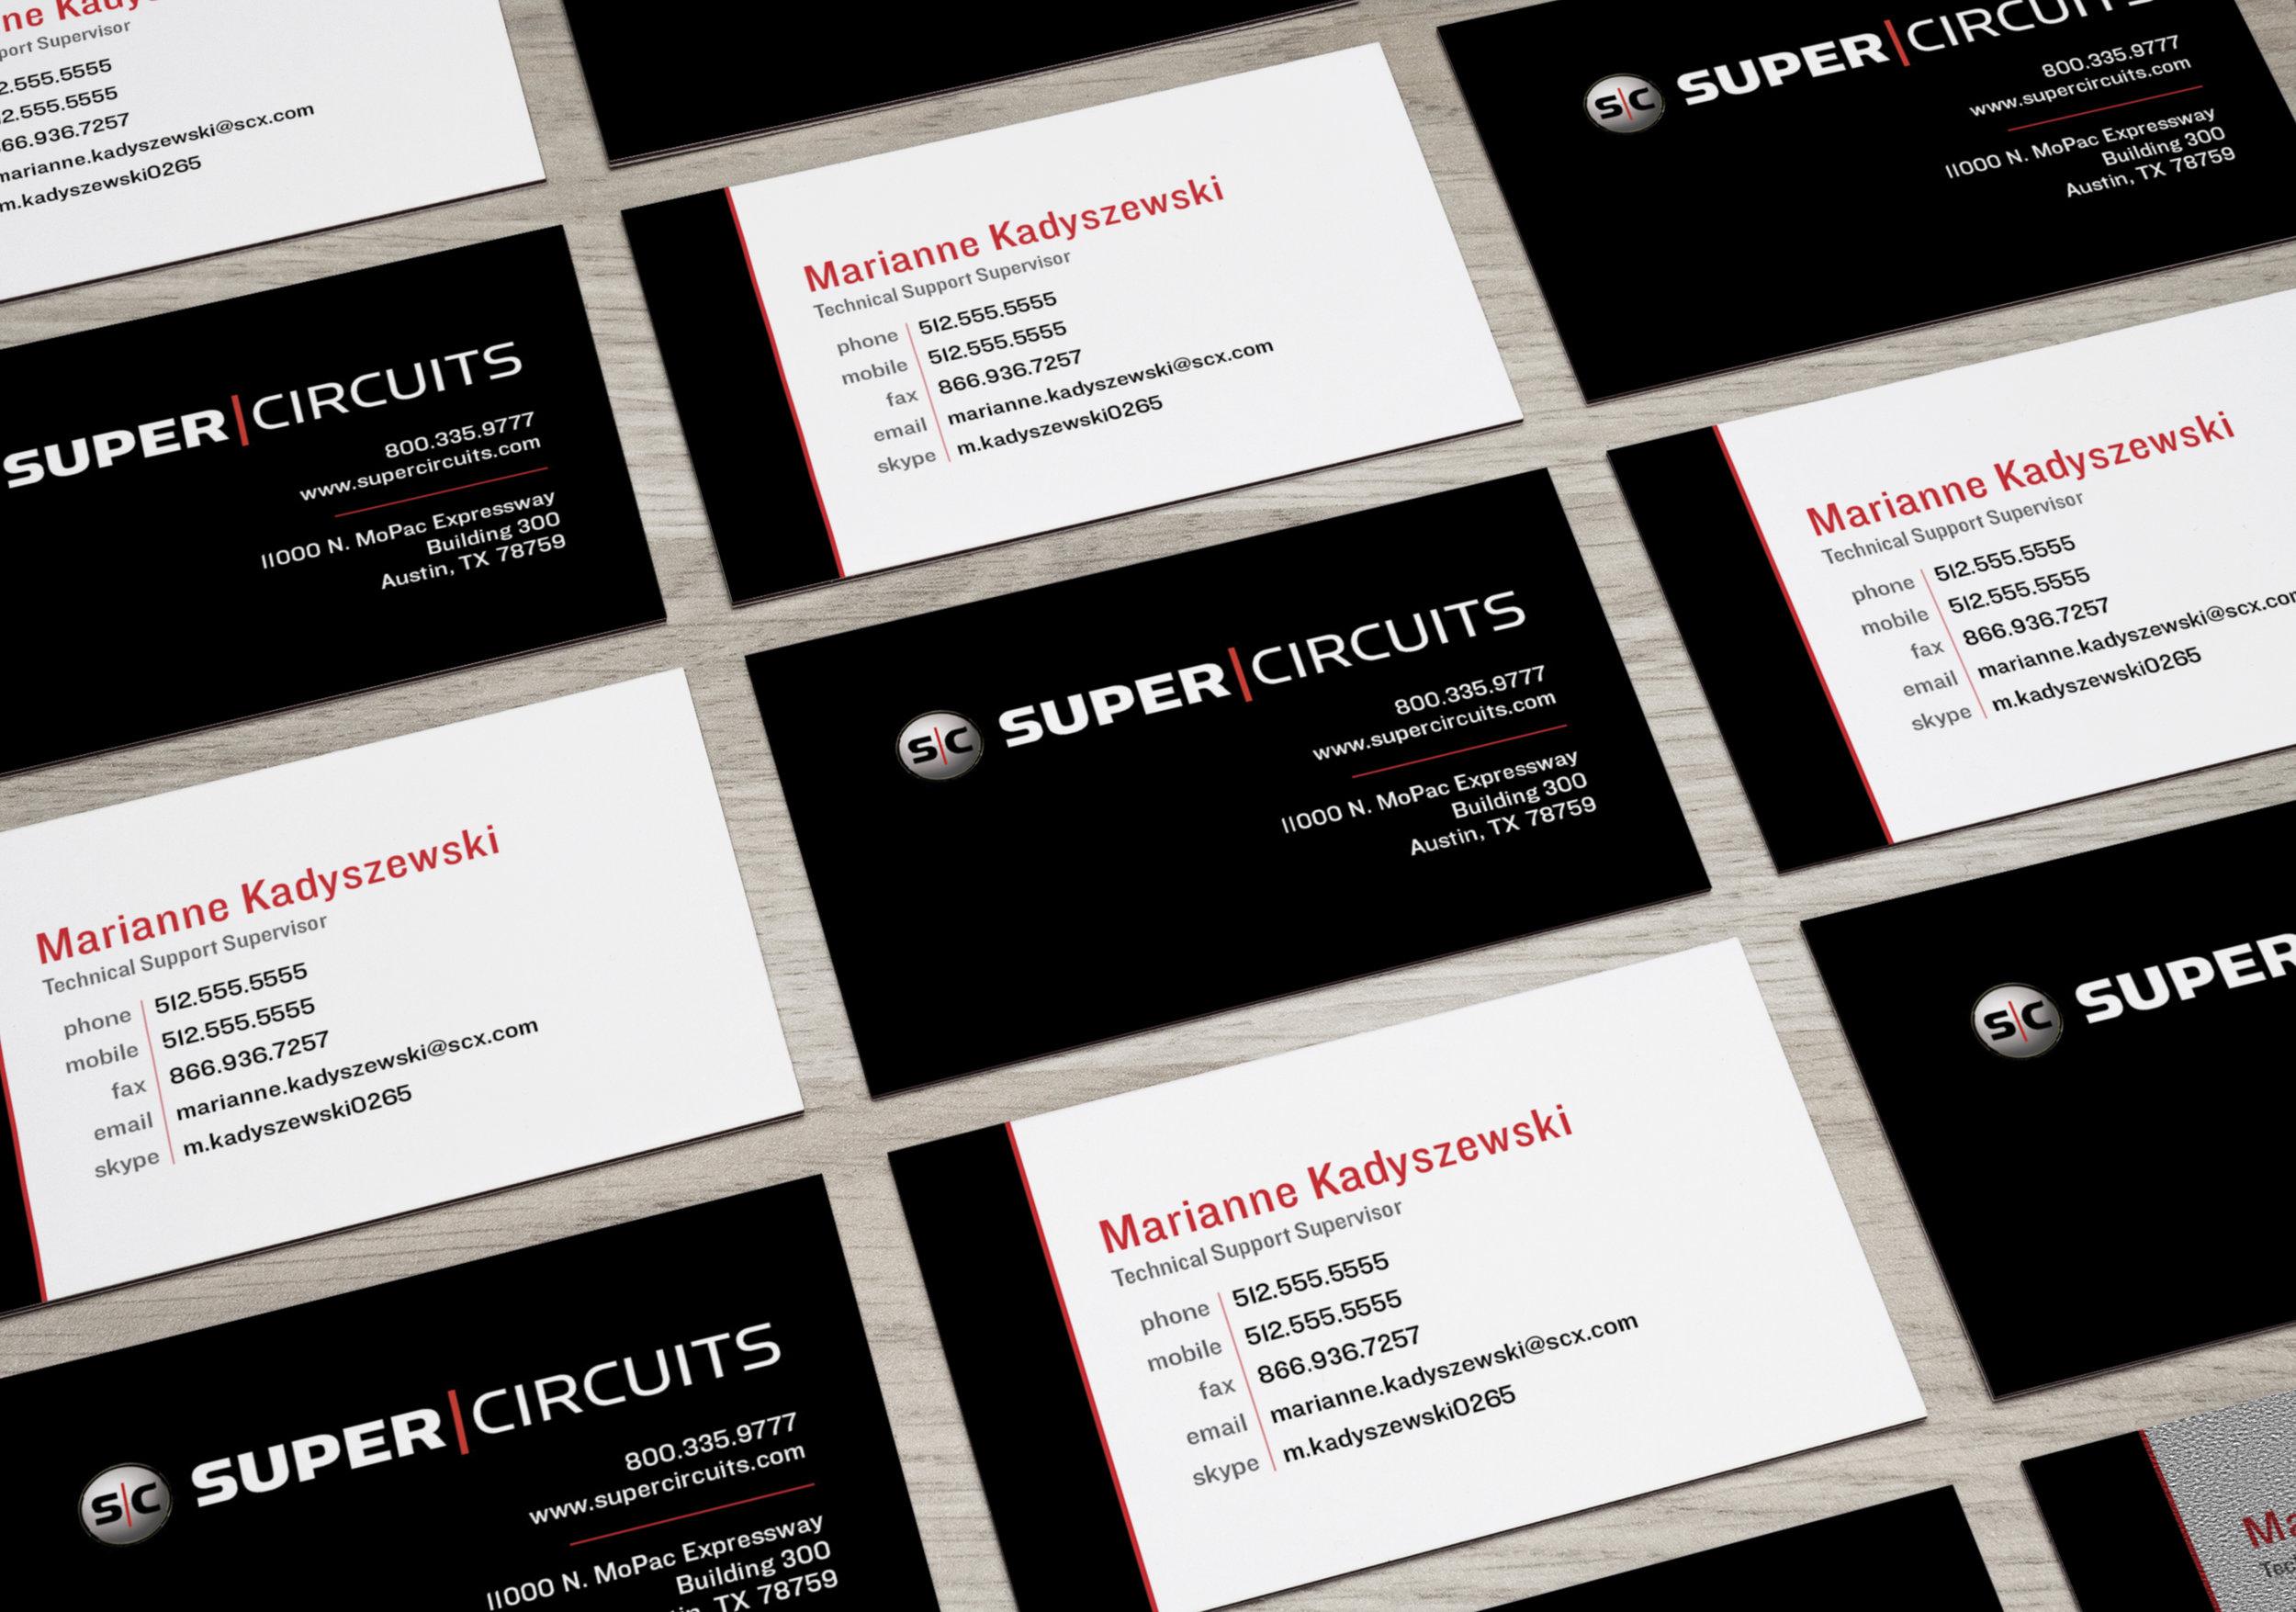 supercircuit-businesscards-mockup-2.jpg